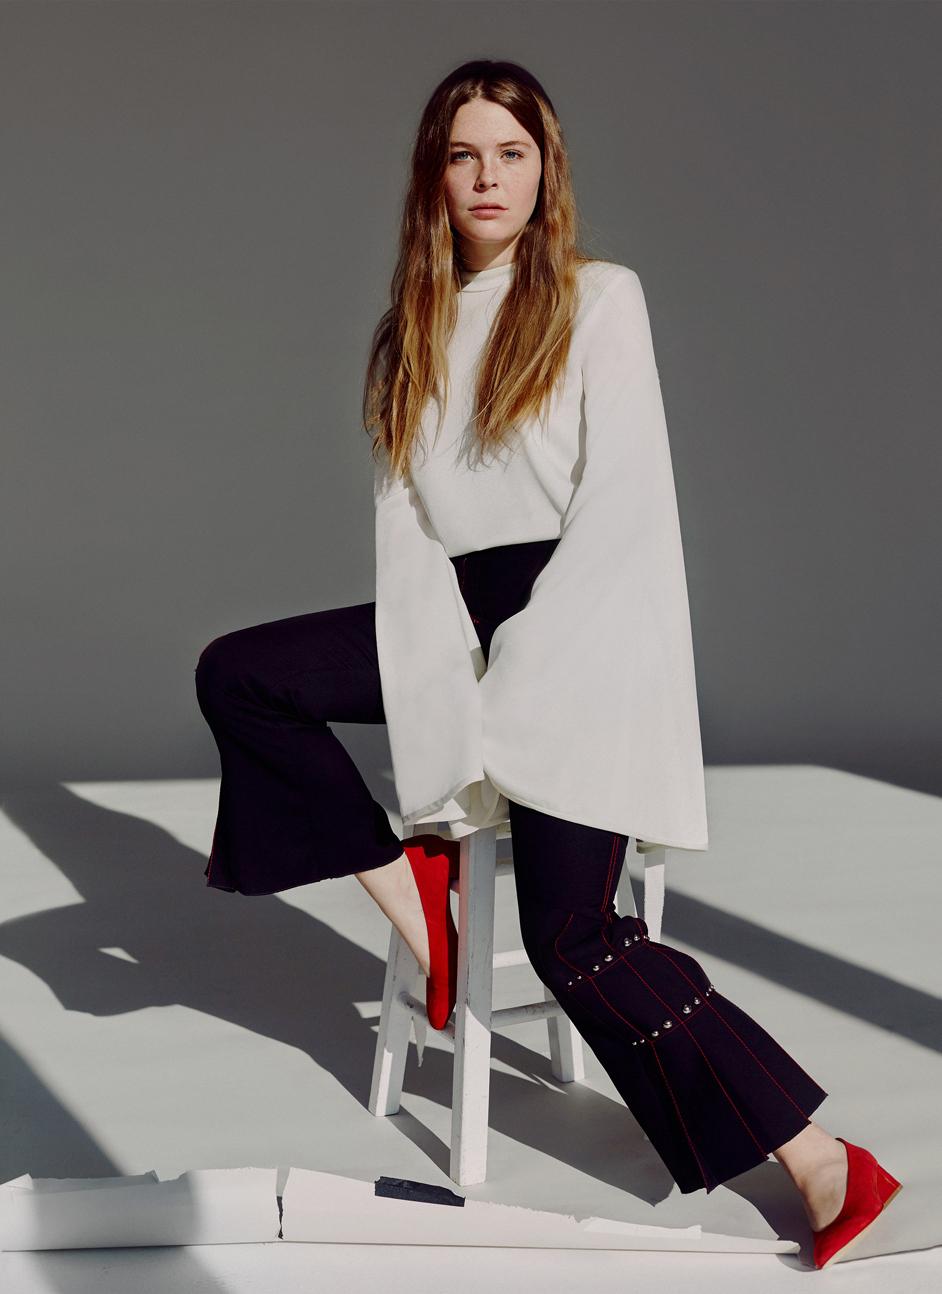 Maggie Rogers / W Magazine